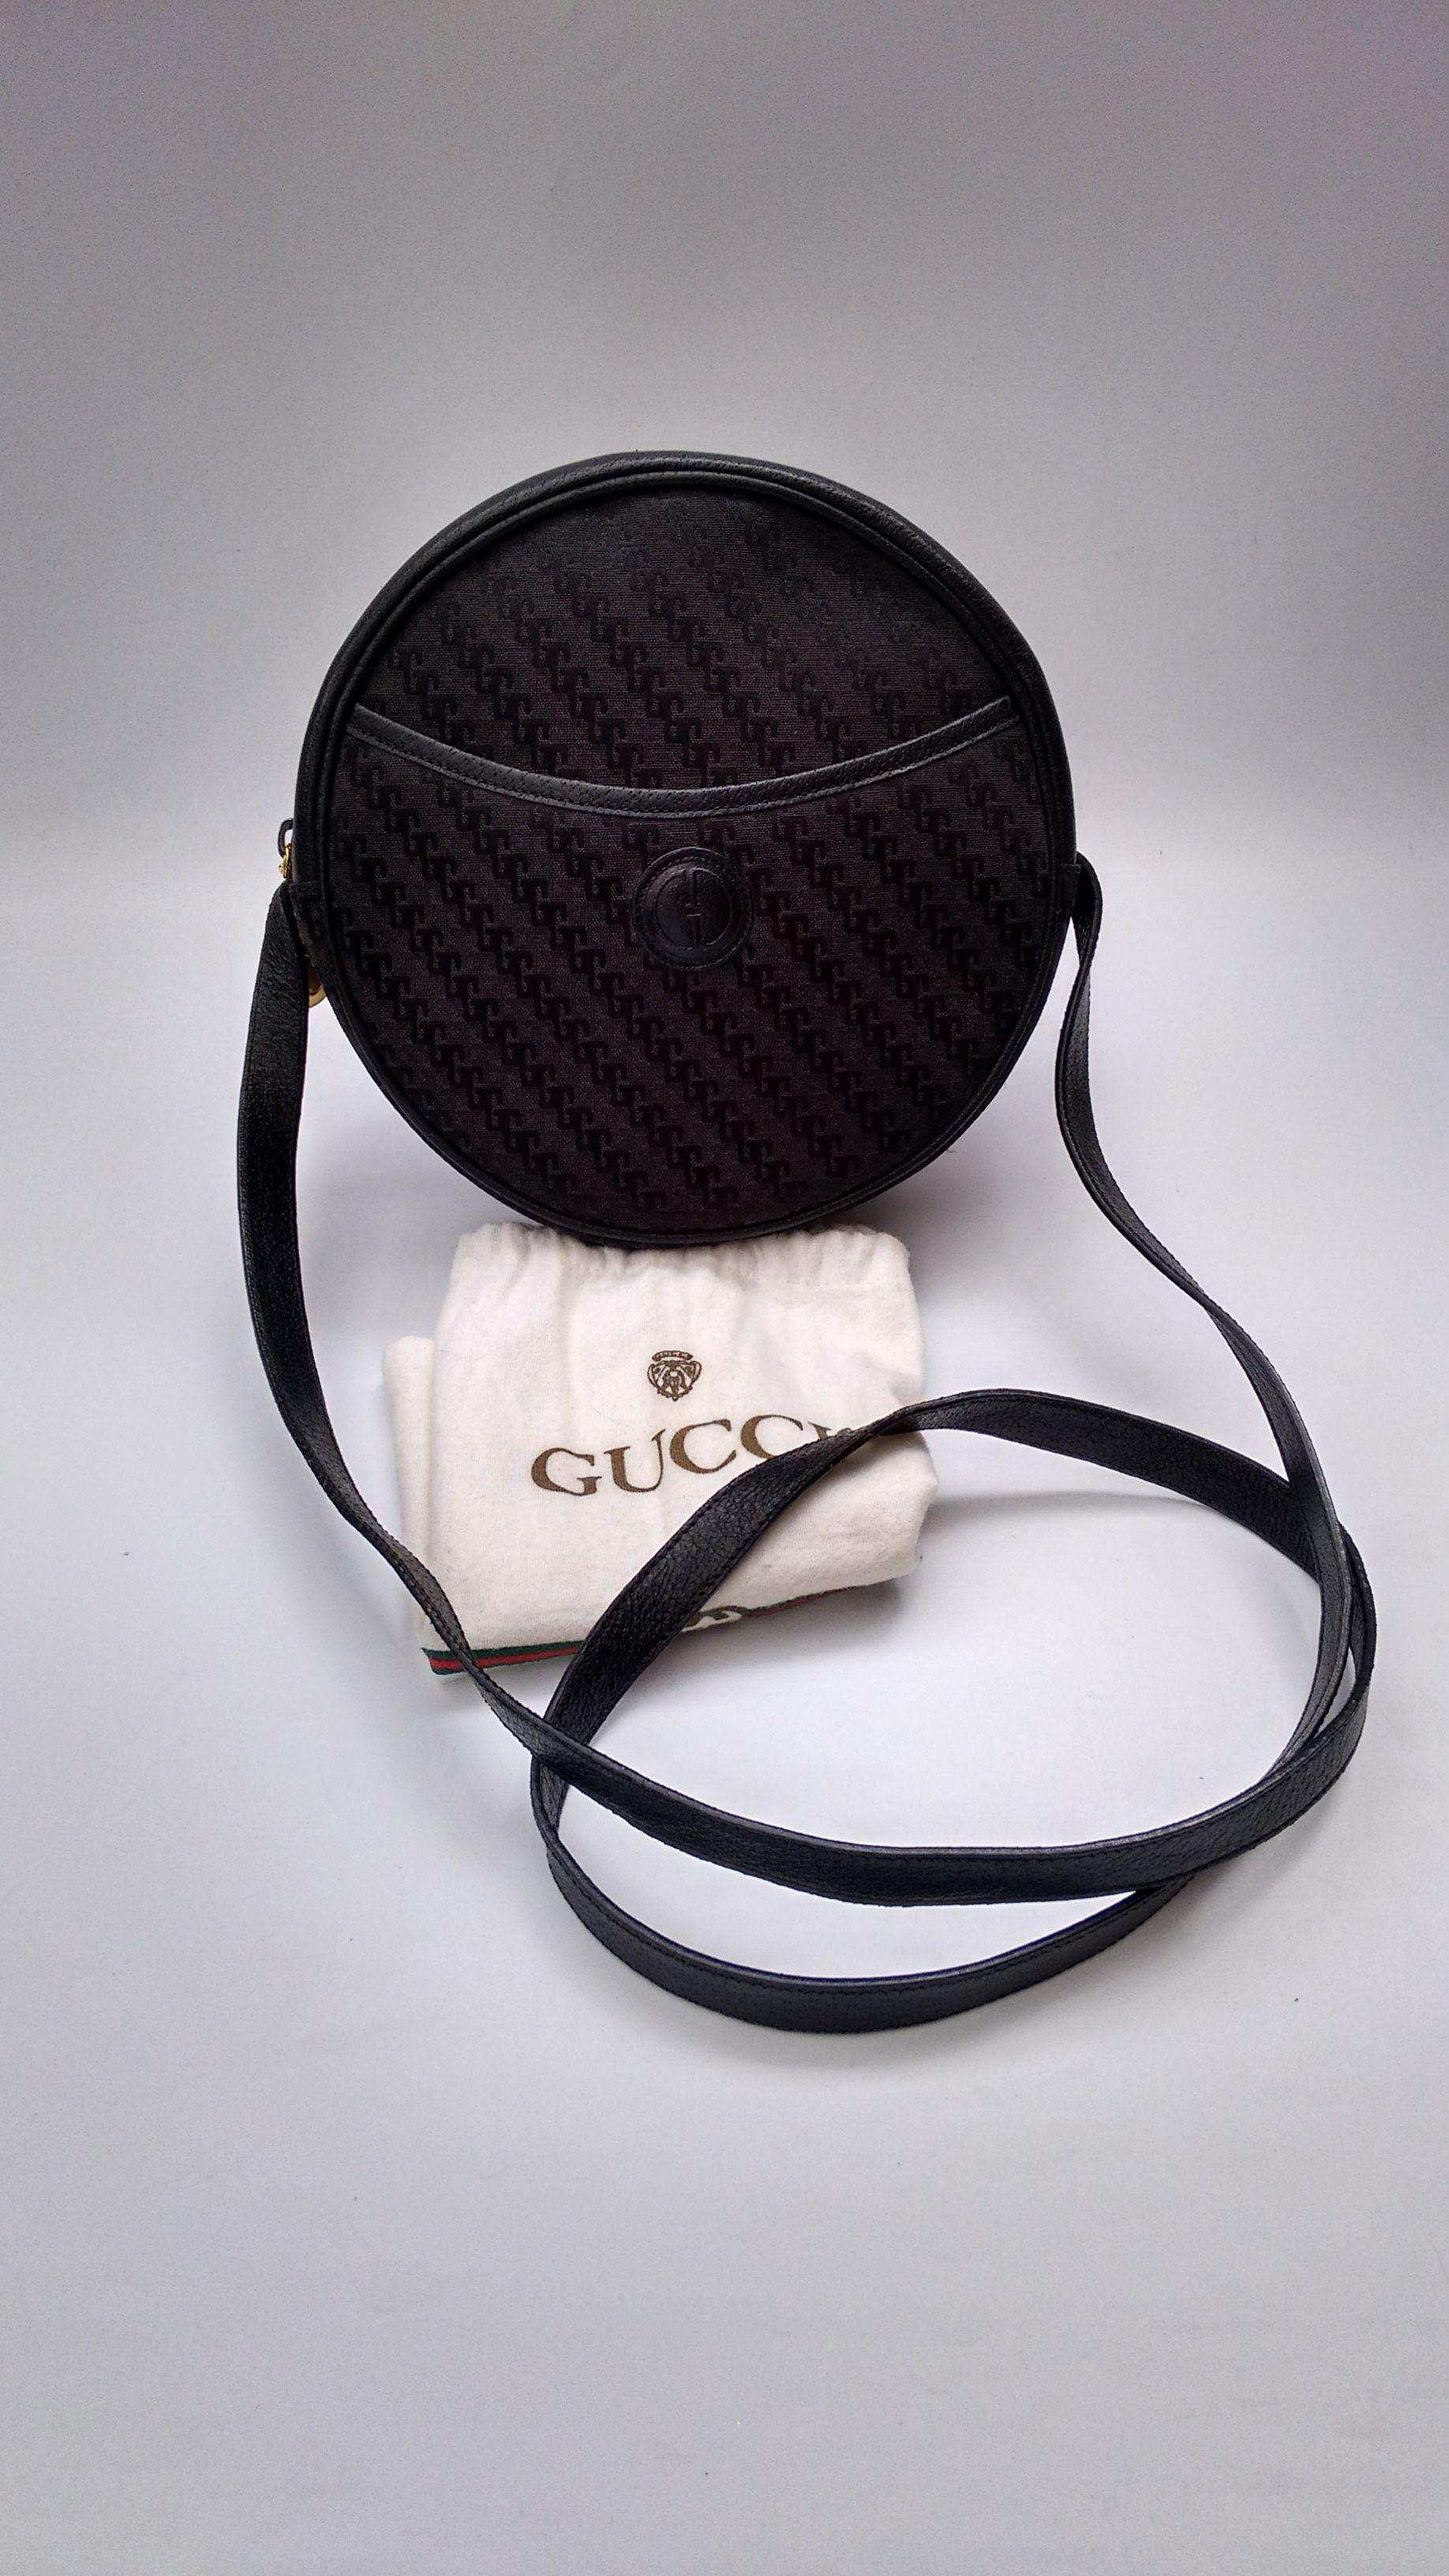 4d5953cc3c8f GUCCI Bag. Gucci Vintage GG Monogram Black Round Shoulder Bag. Italian  designer purse with a dustbag. Tom Ford Era.